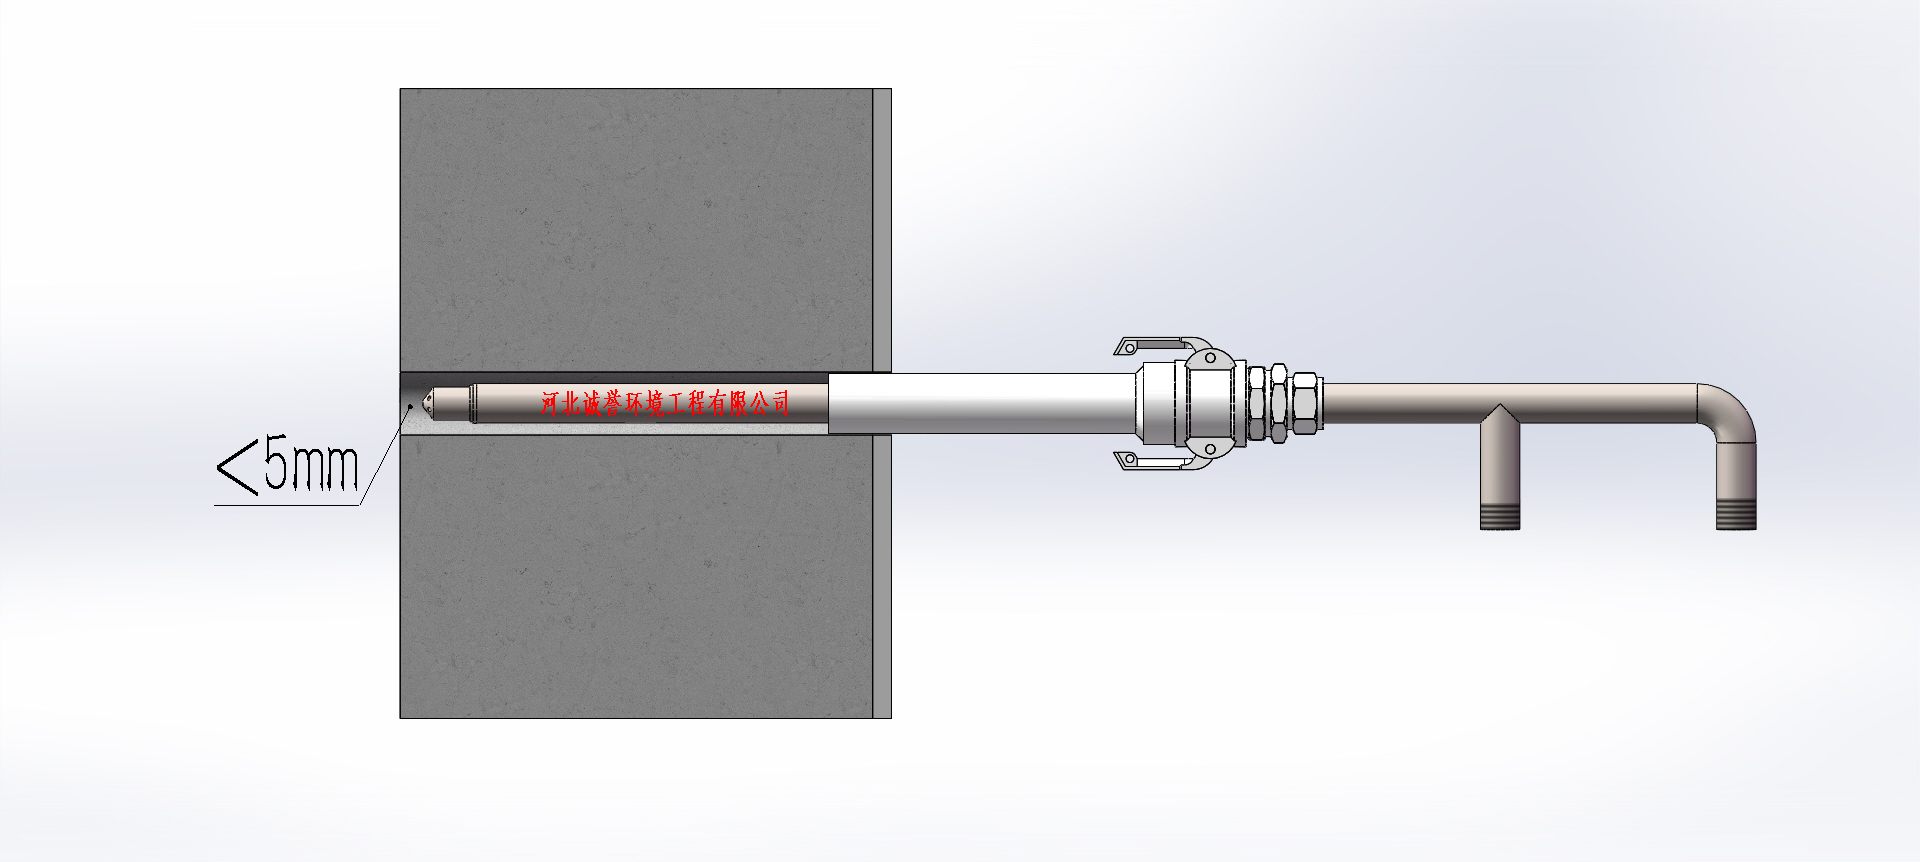 SNCR脱硝喷枪安装固定套筒